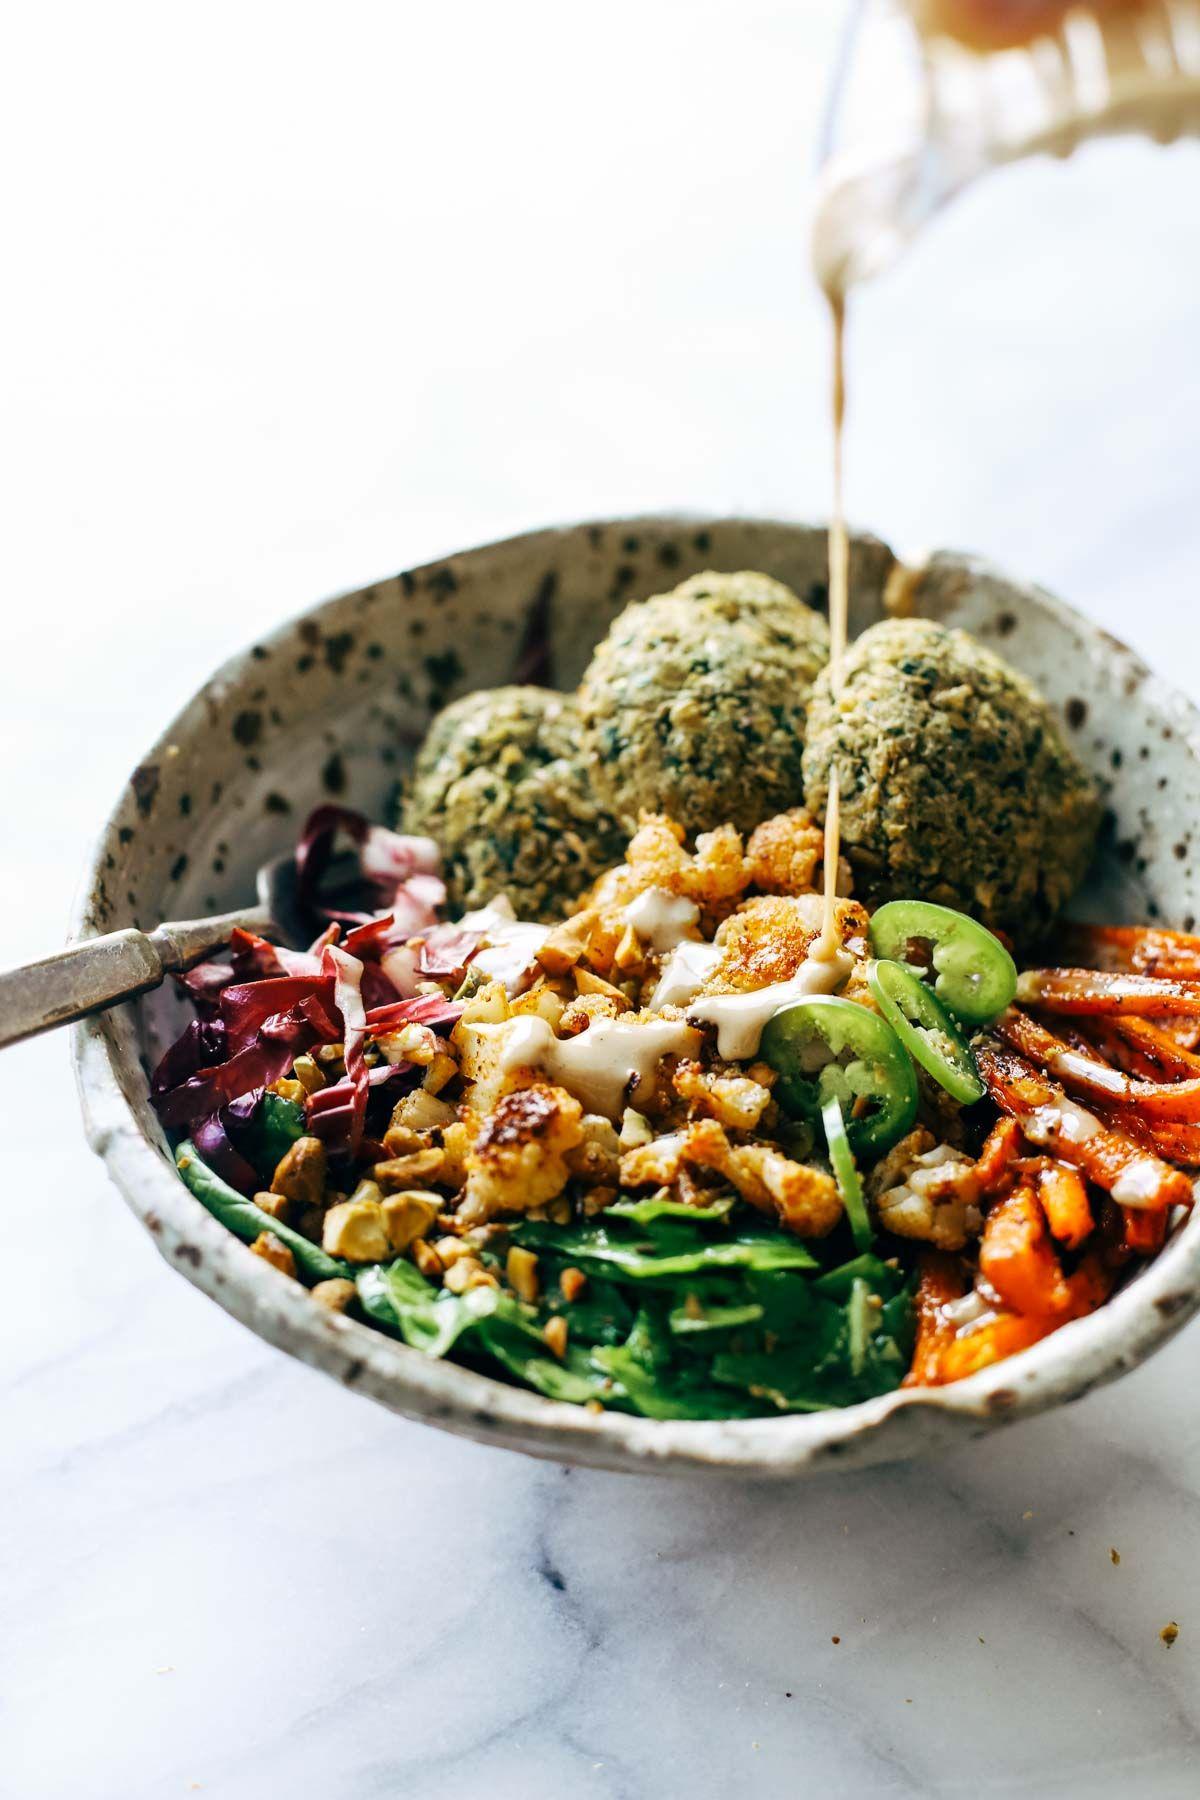 30 Gorgeous Vegan Recipes Everyone WillLove